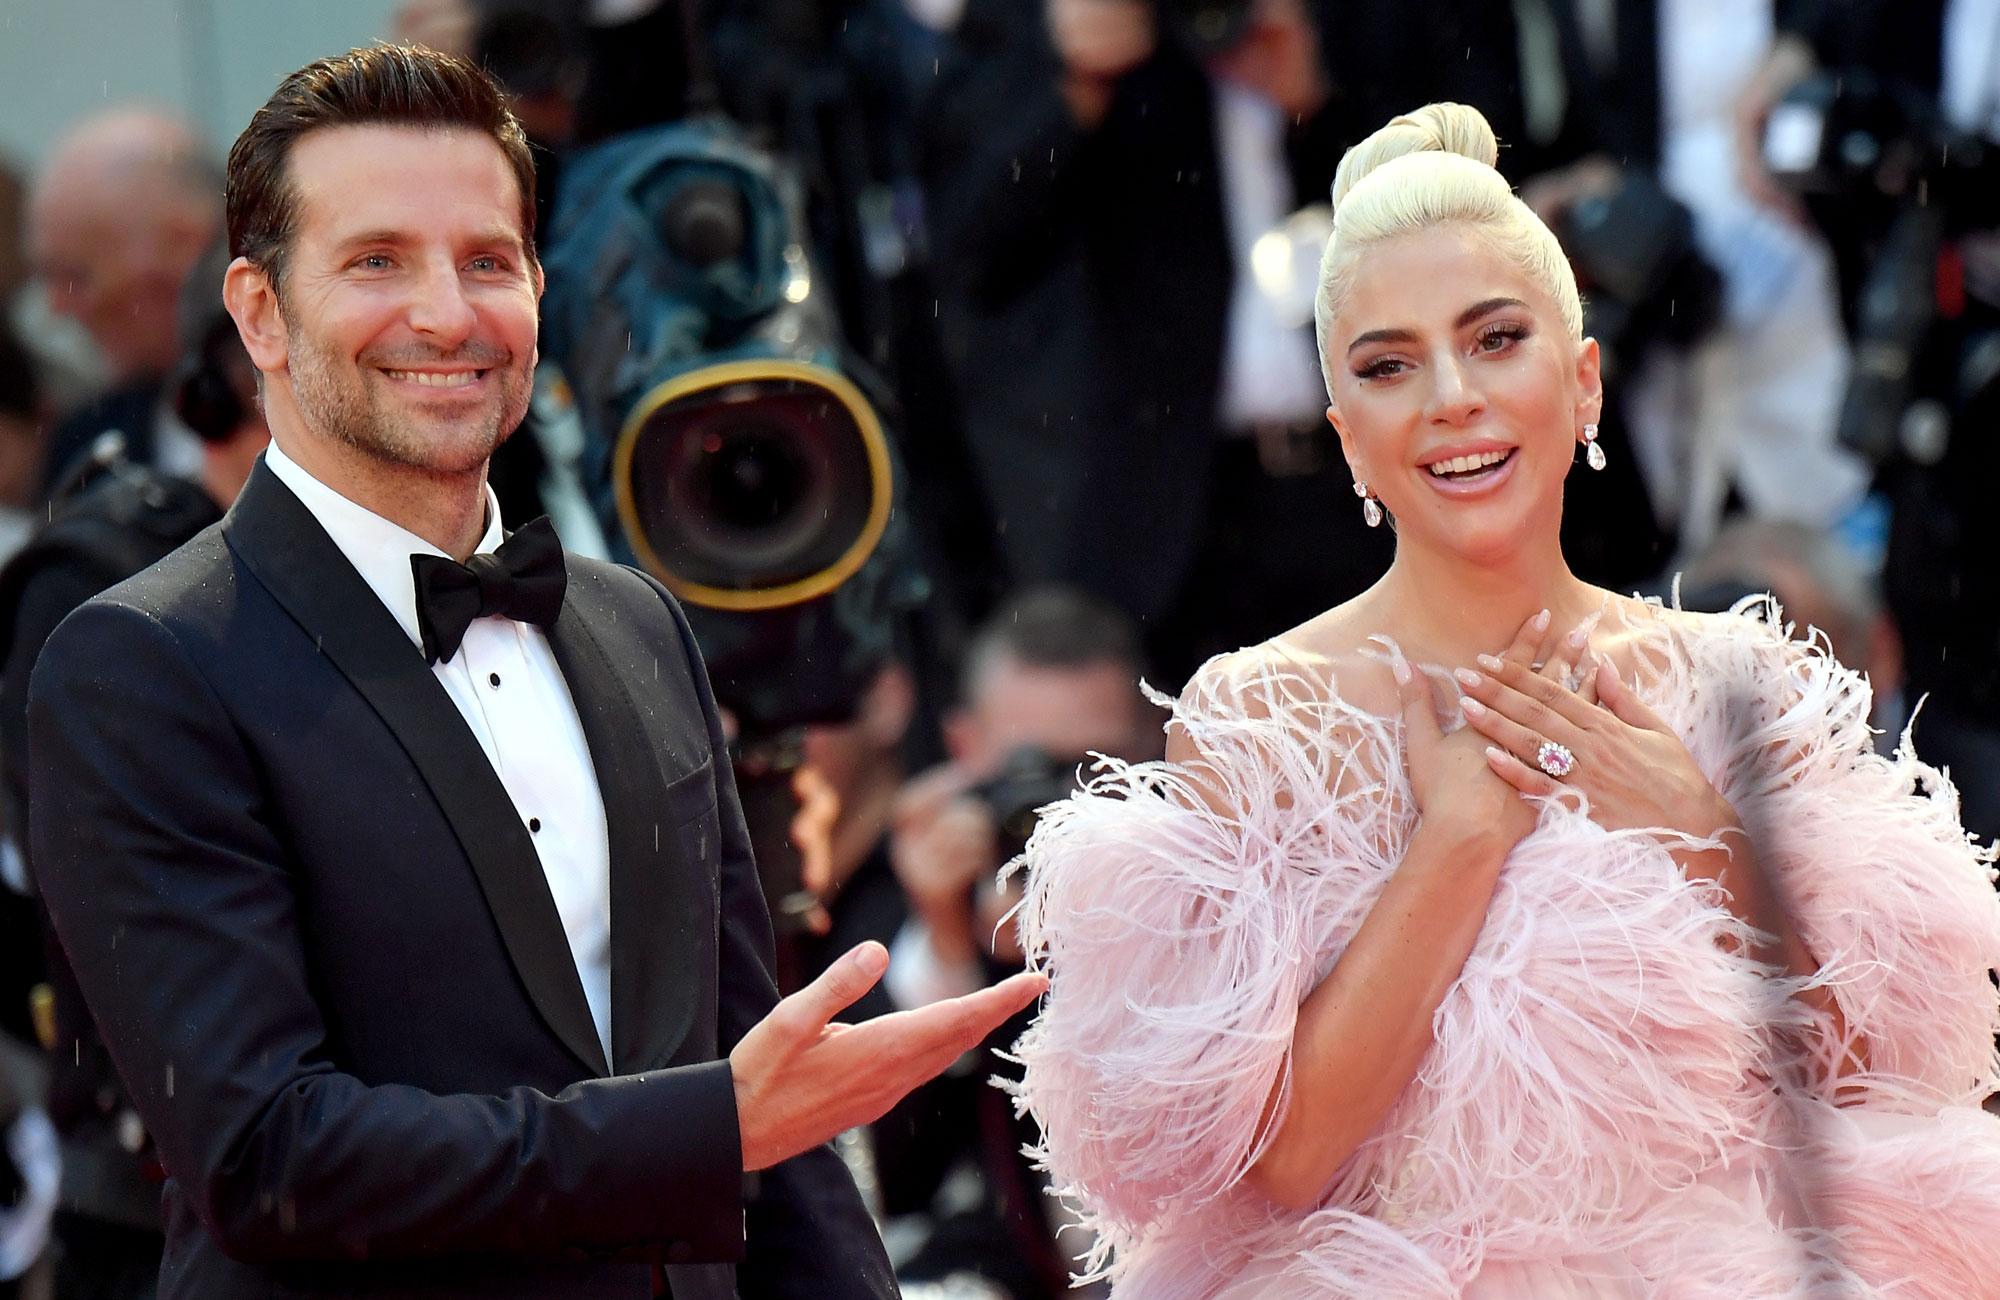 Bradley Cooper Dismisses 'A Star Is Born' Tour Reunion Lady Gaga 75th Venice Film Festival